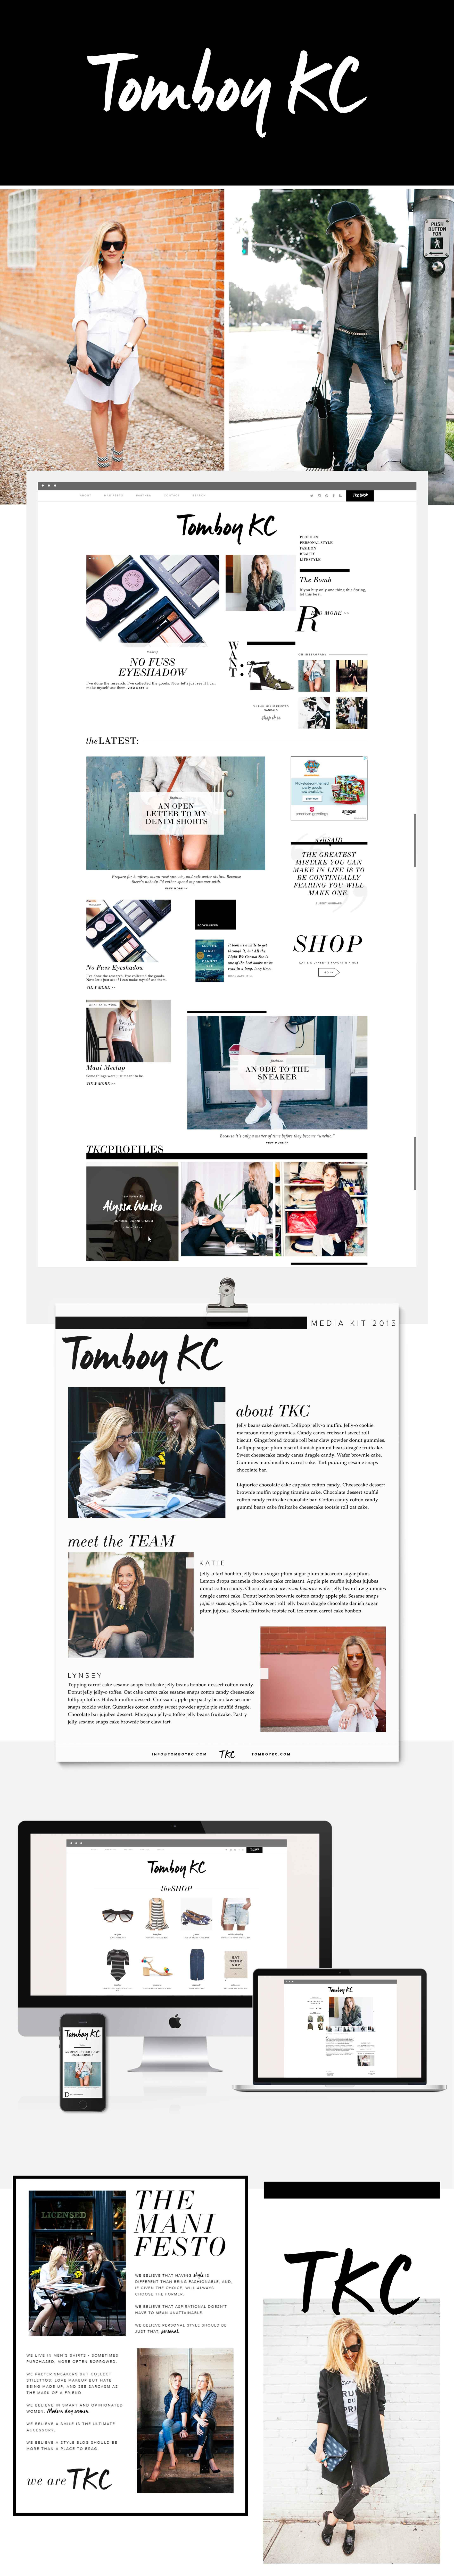 Tomboy KC | site design by Victoria McGinley Studio